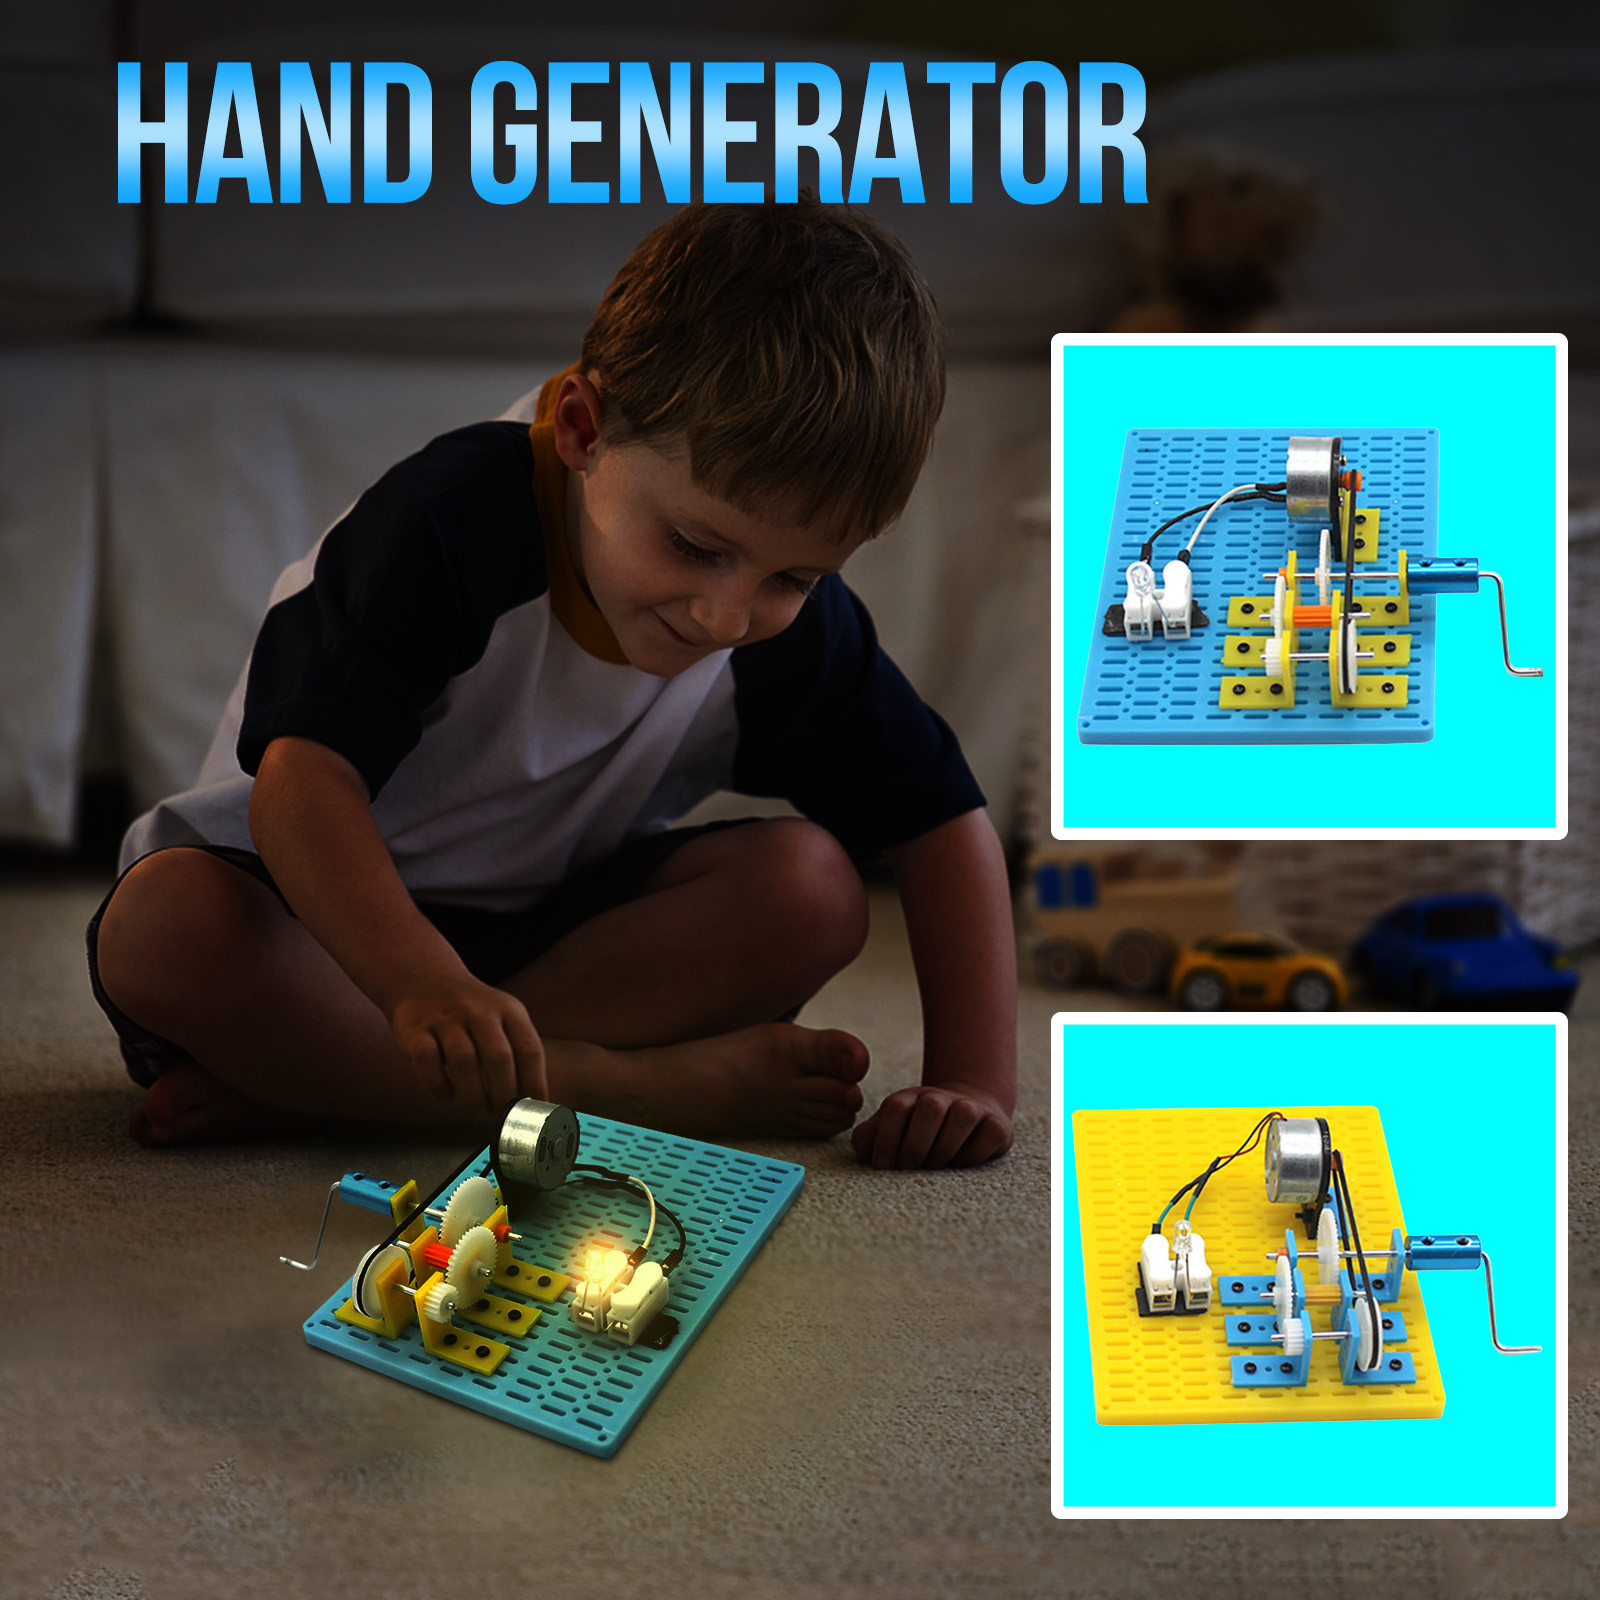 Mini manivela generador modelo Kit tecnológico experimento de ciencia juguete infantil educativo Led iluminación